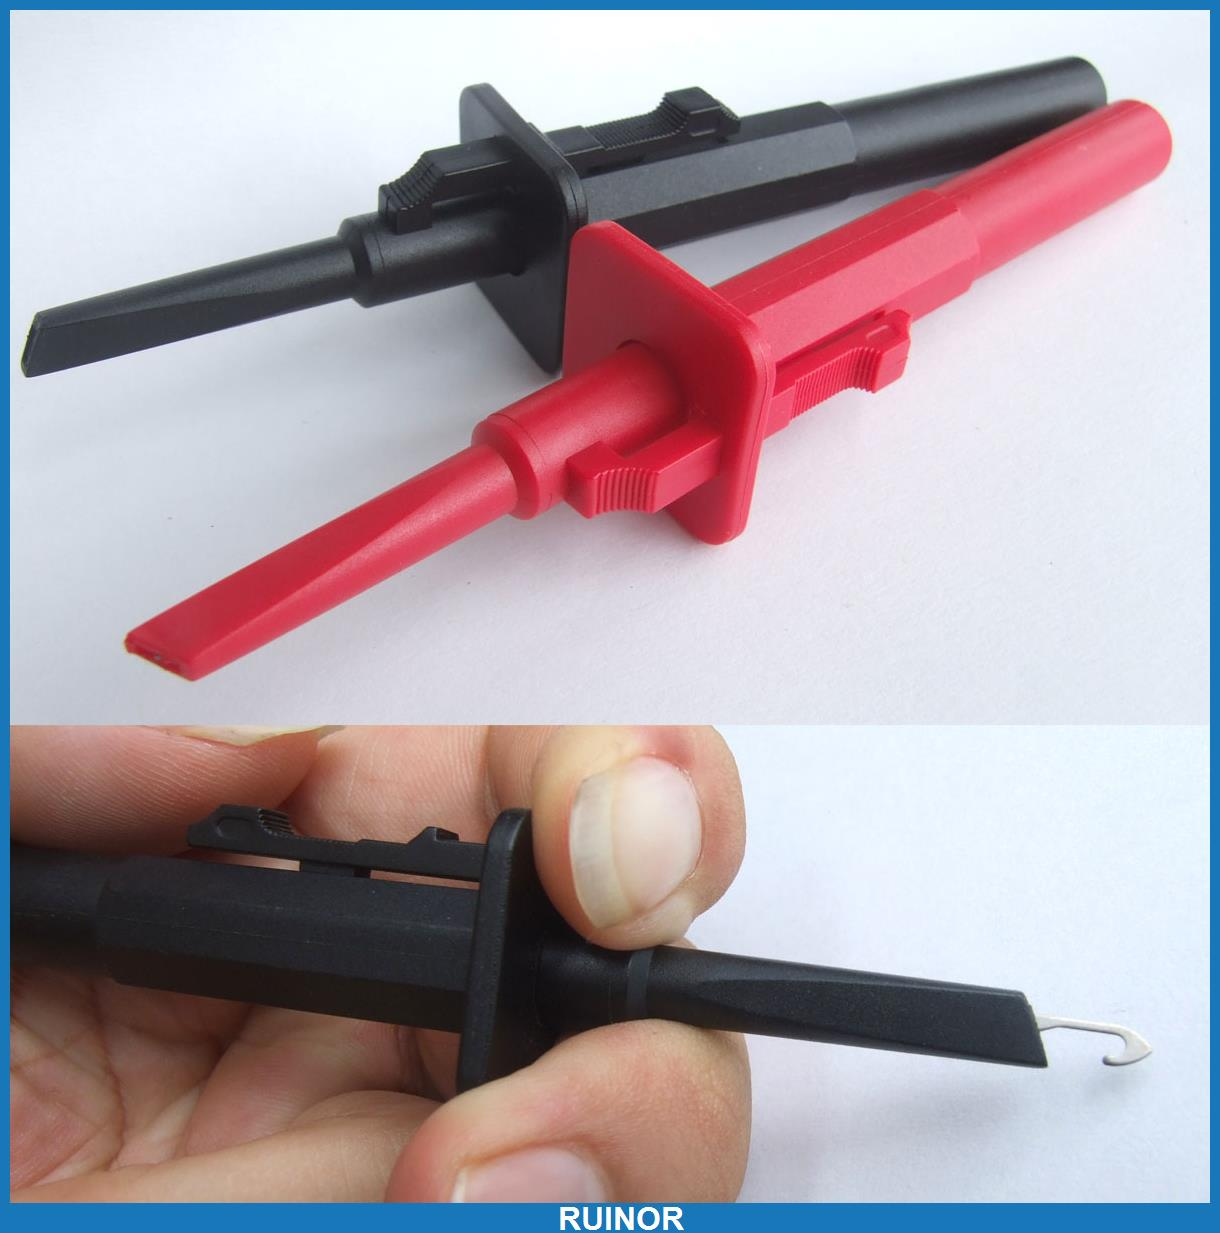 ФОТО 2pcs 1000V 10A Safe Fast Test Hook Clips Probes Adapter for Car 4mm Banana Plug